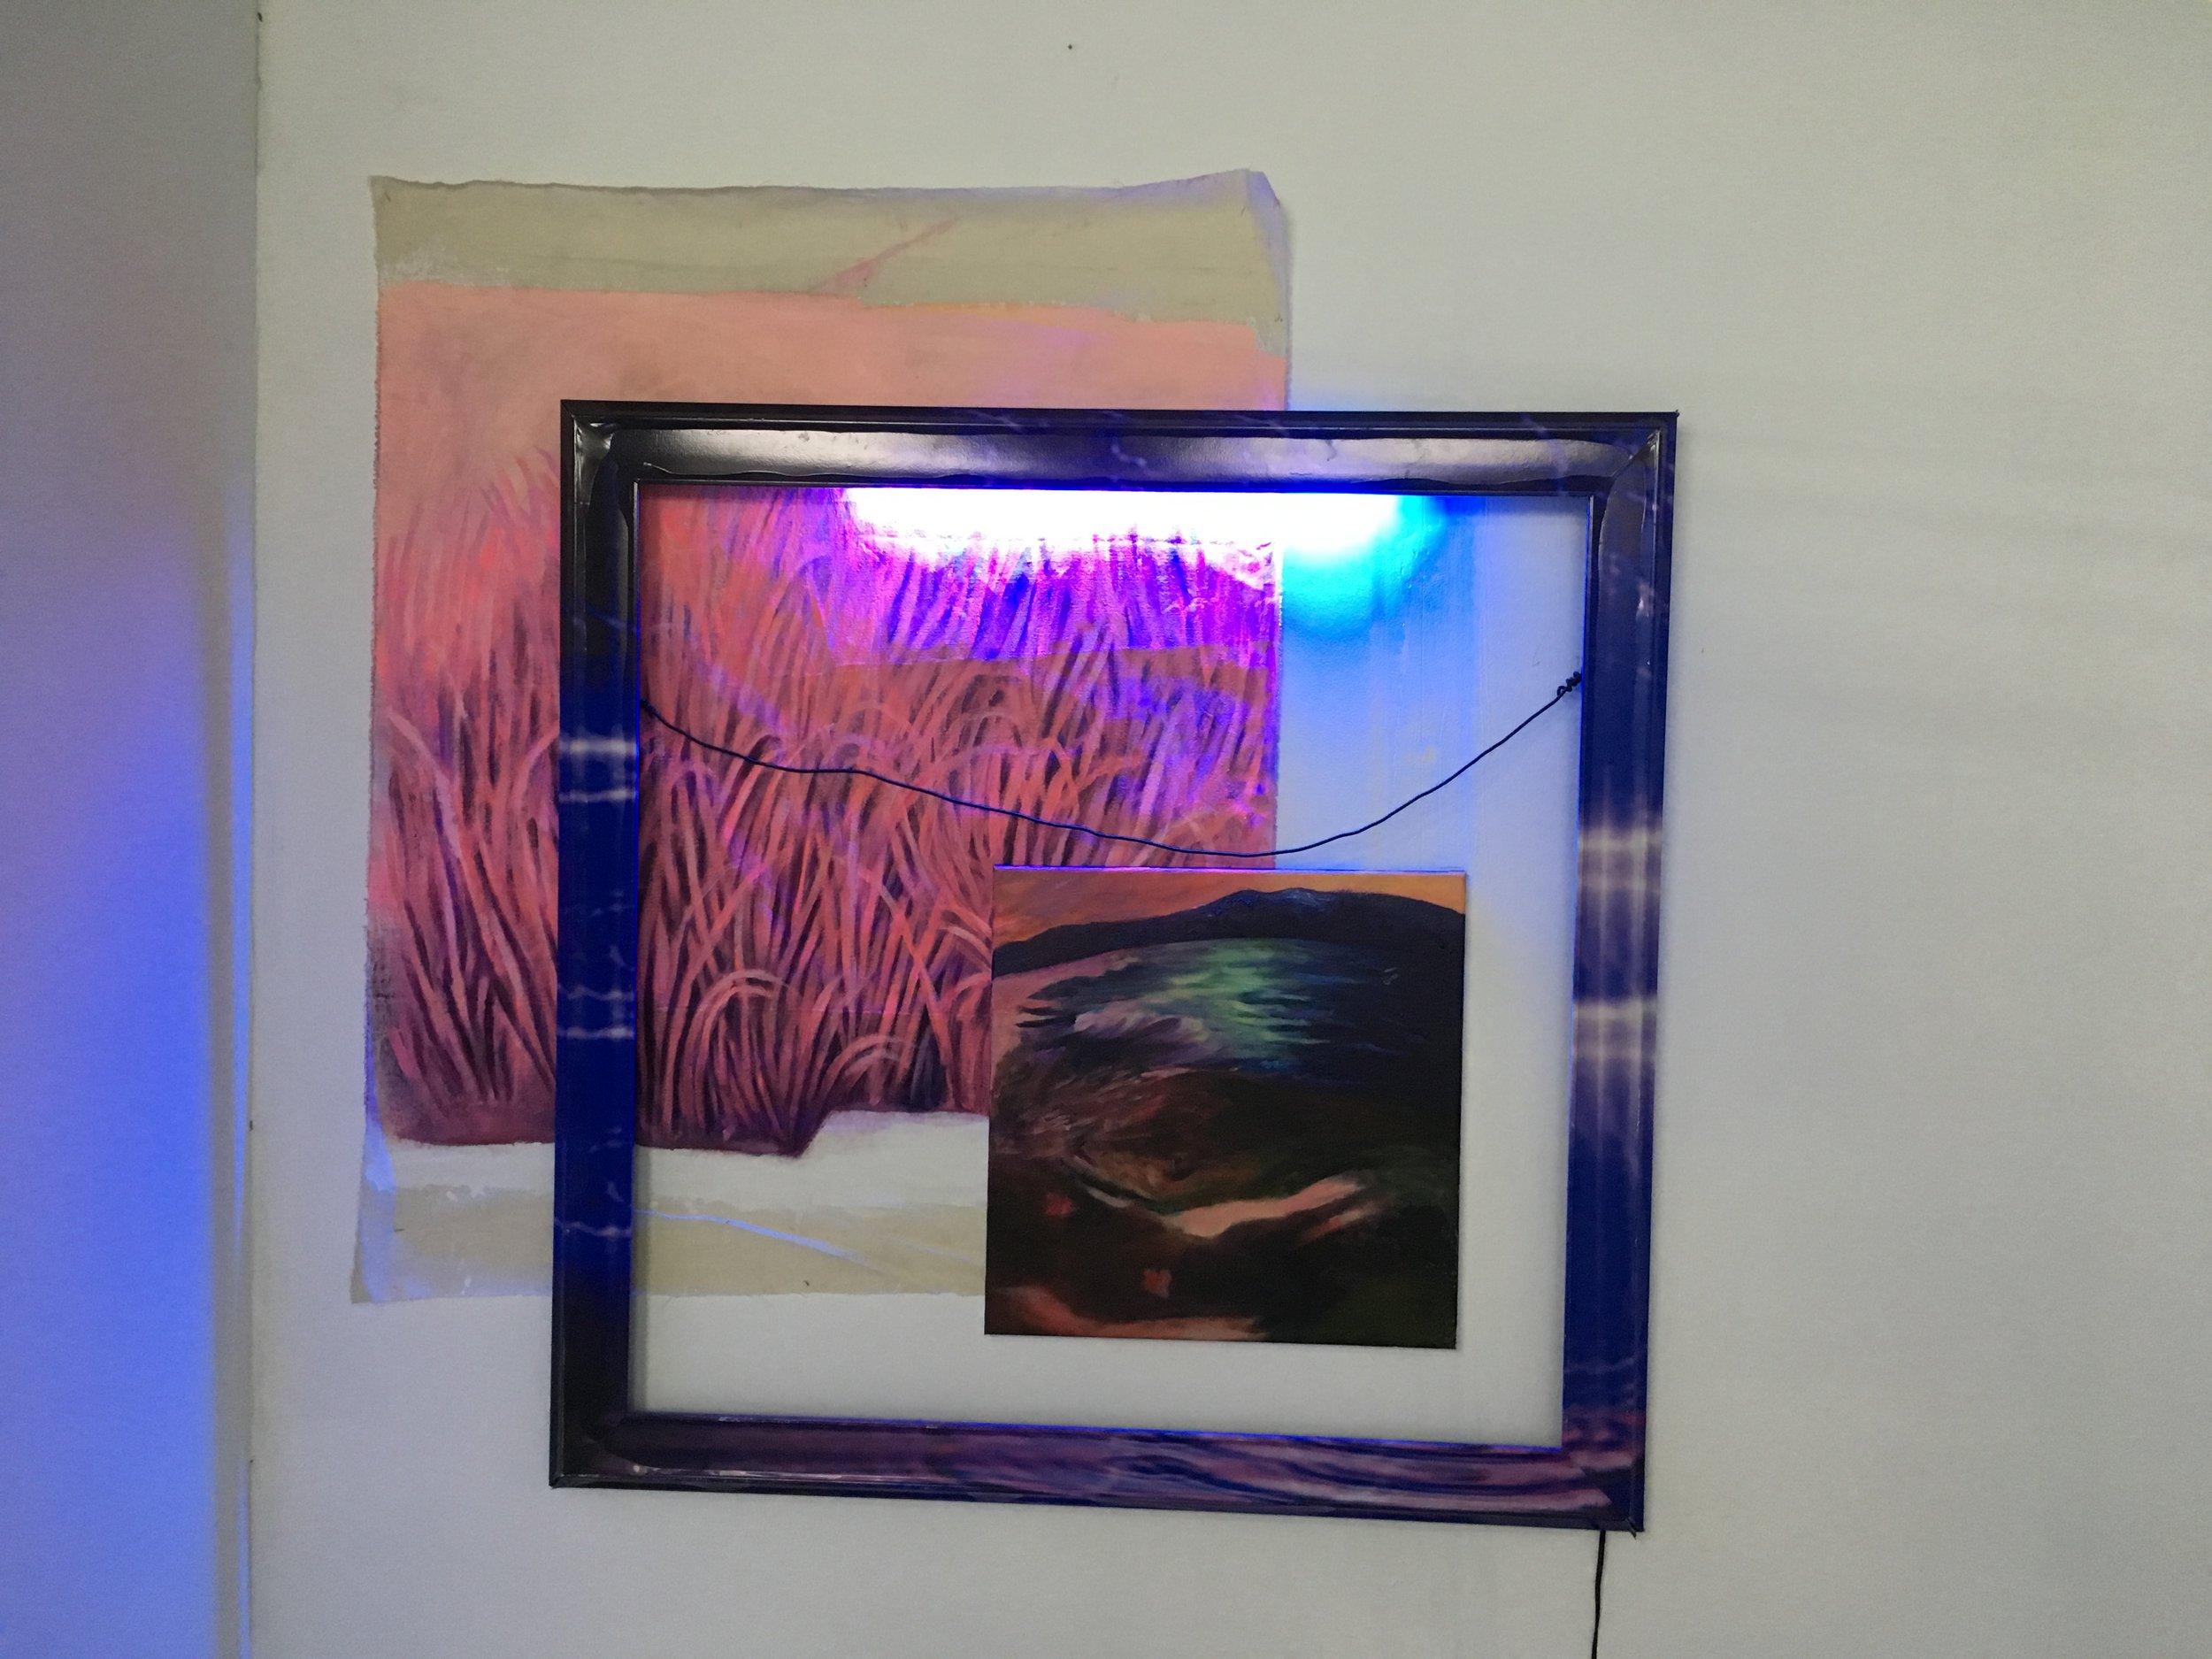 "LOVELY LOVELY LOVV, 2012-18  acrylic, digital print on sticker, frame, blue light, canvas 50"" x 50"""